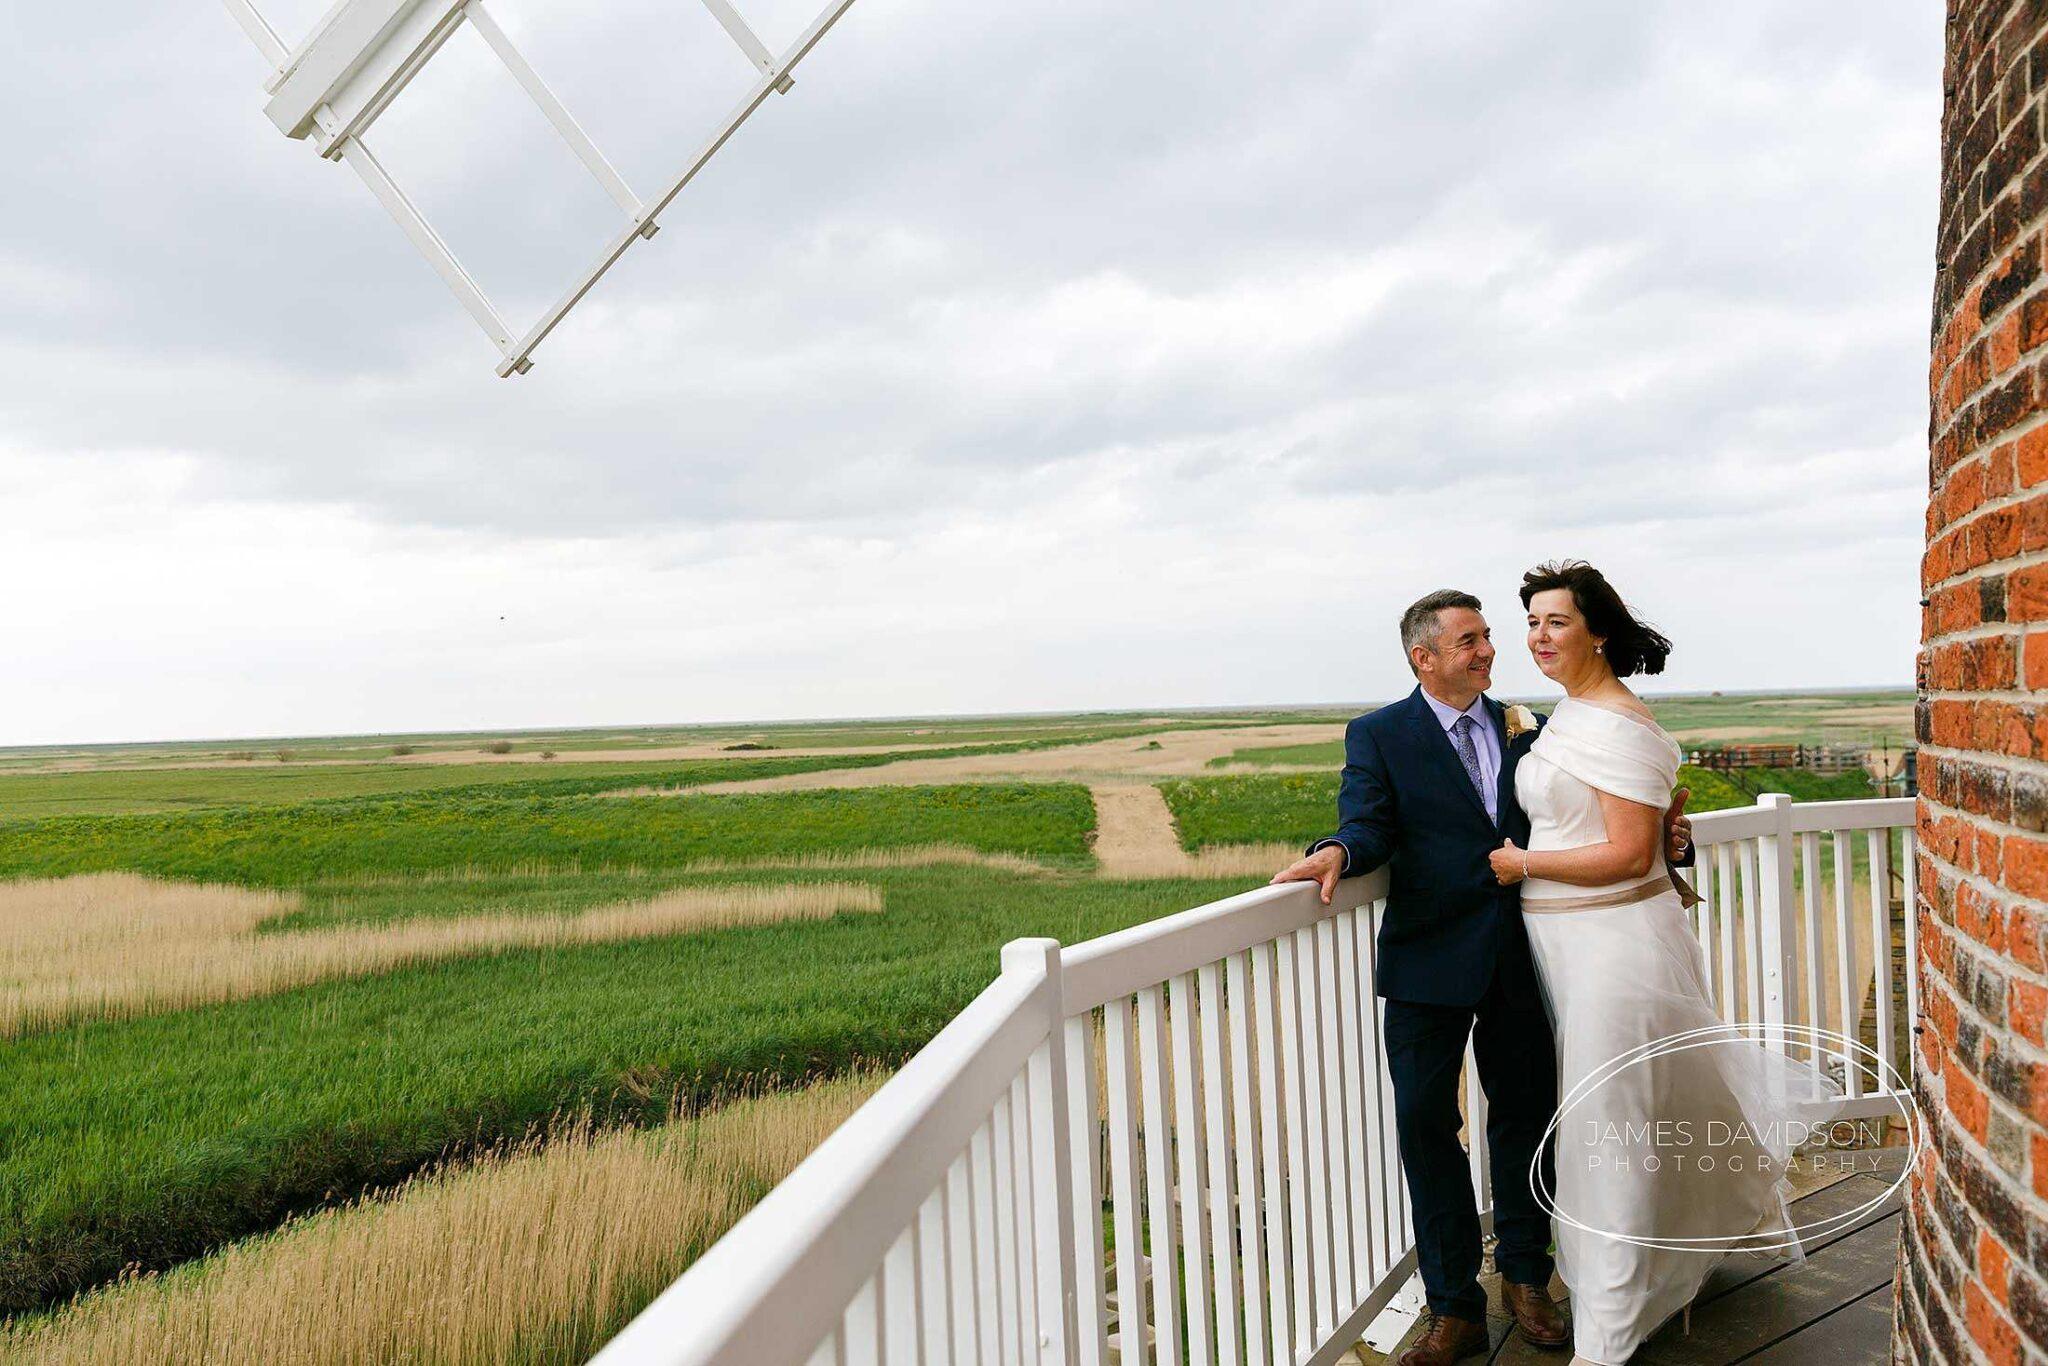 Cley windmill wedding photographer